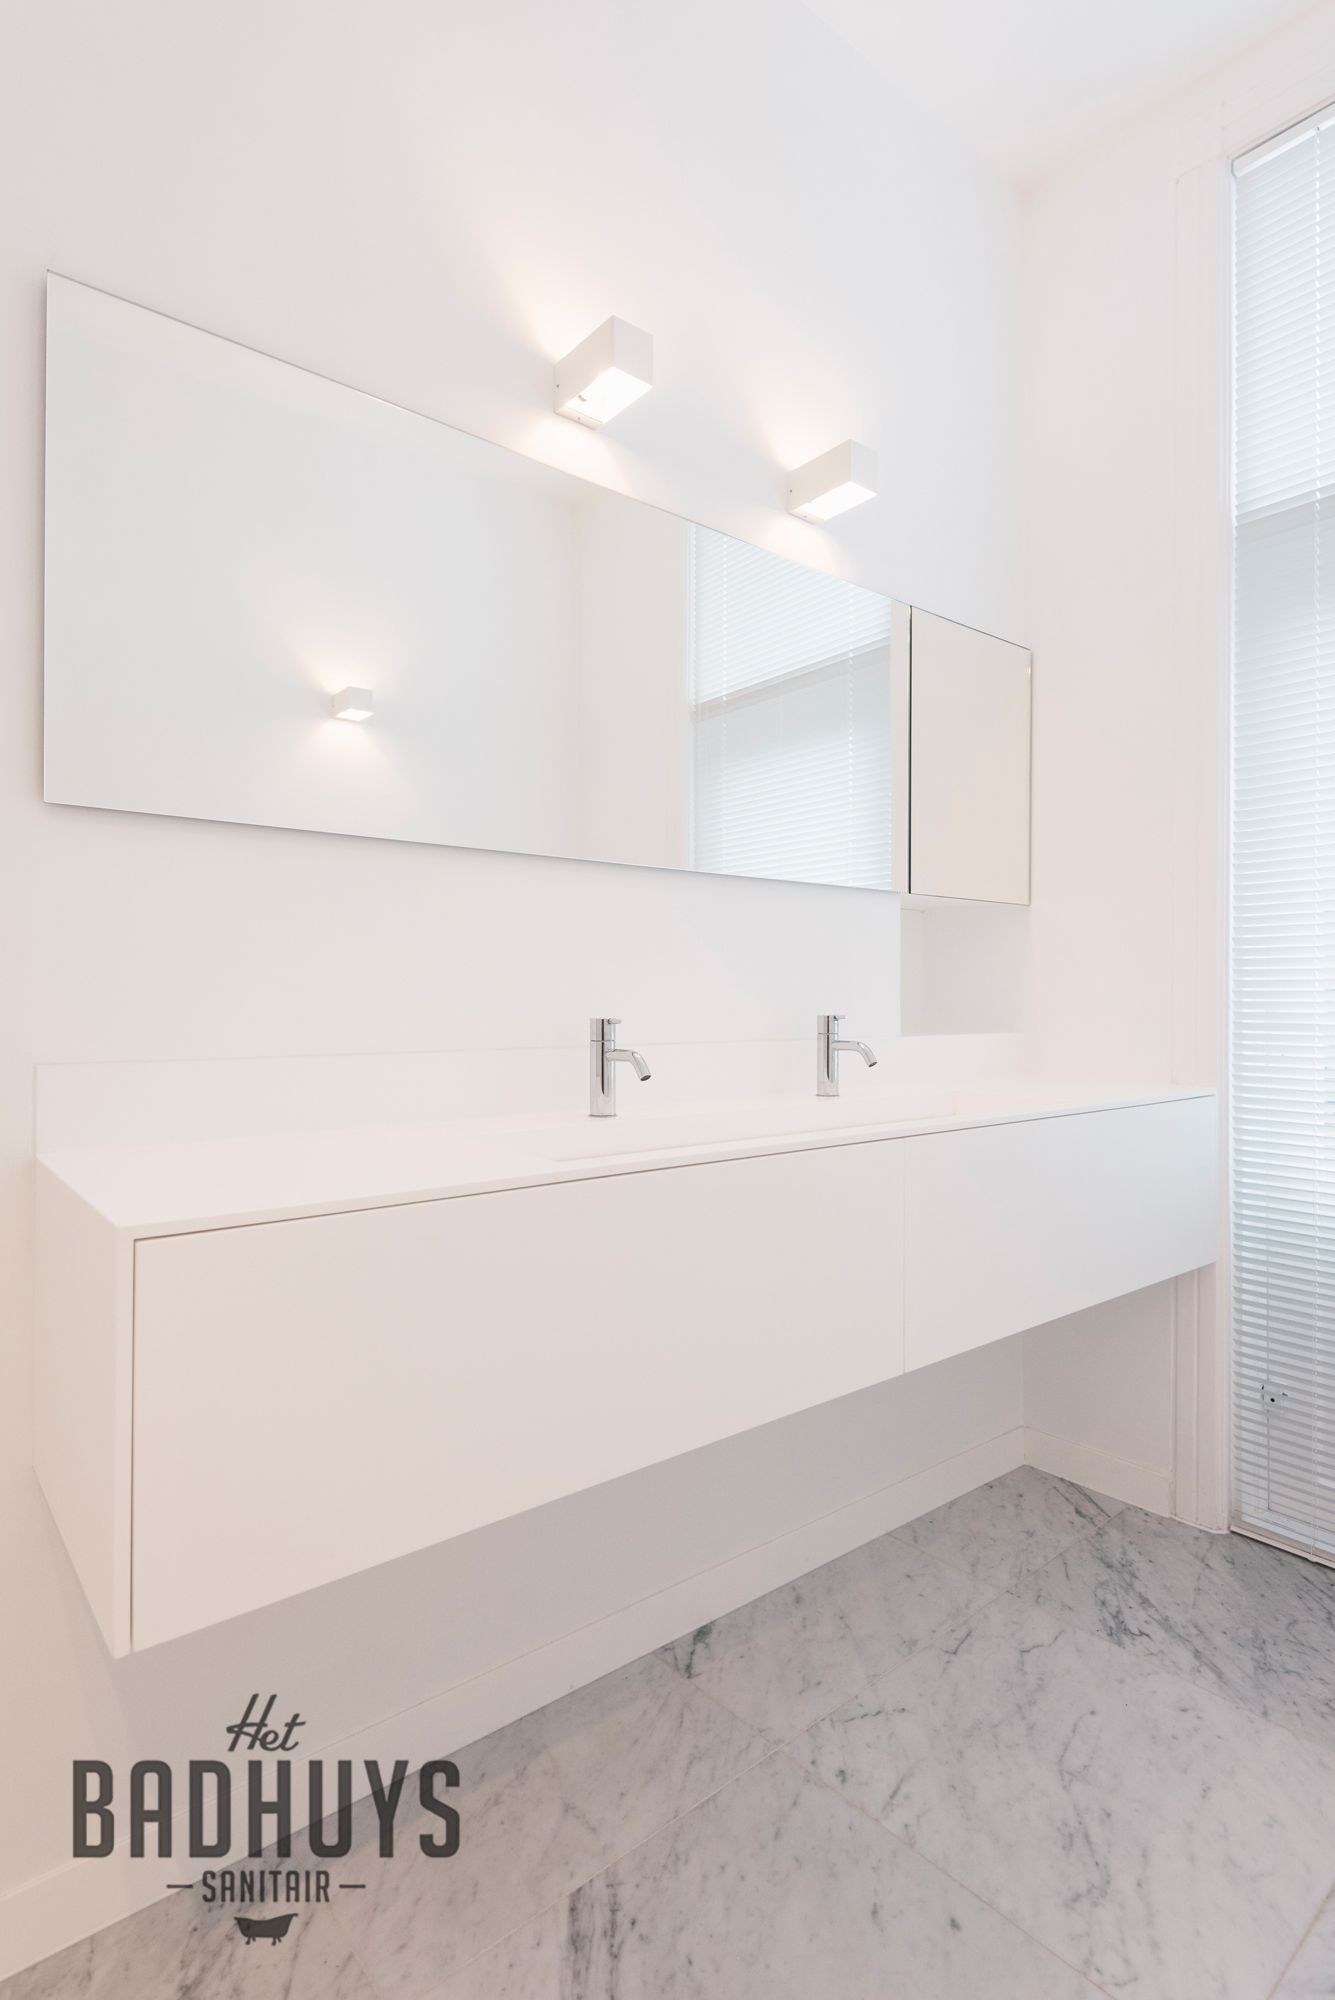 Het Badhuys Breda- verlichting boven lavabo | Bathroom | Pinterest ...